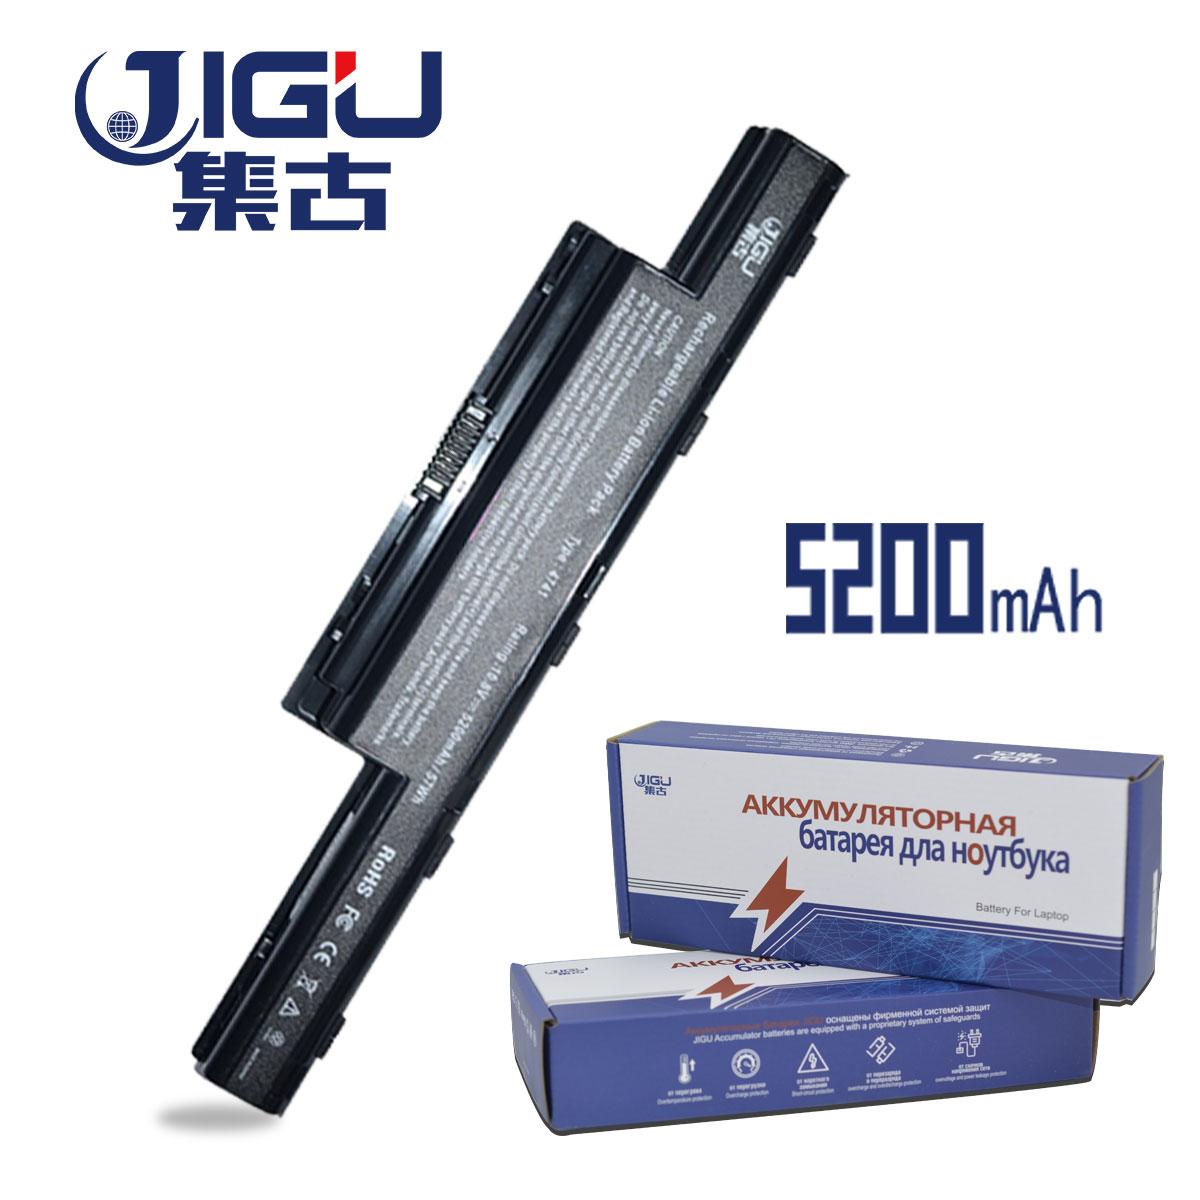 JIGU Laptop Battery For Acer Aspire V3 V3-471G V3-551G V3-571G E1-471 E1-531 E1-571 V3-771G E1 E1-421 E1-431 Series цена 2017